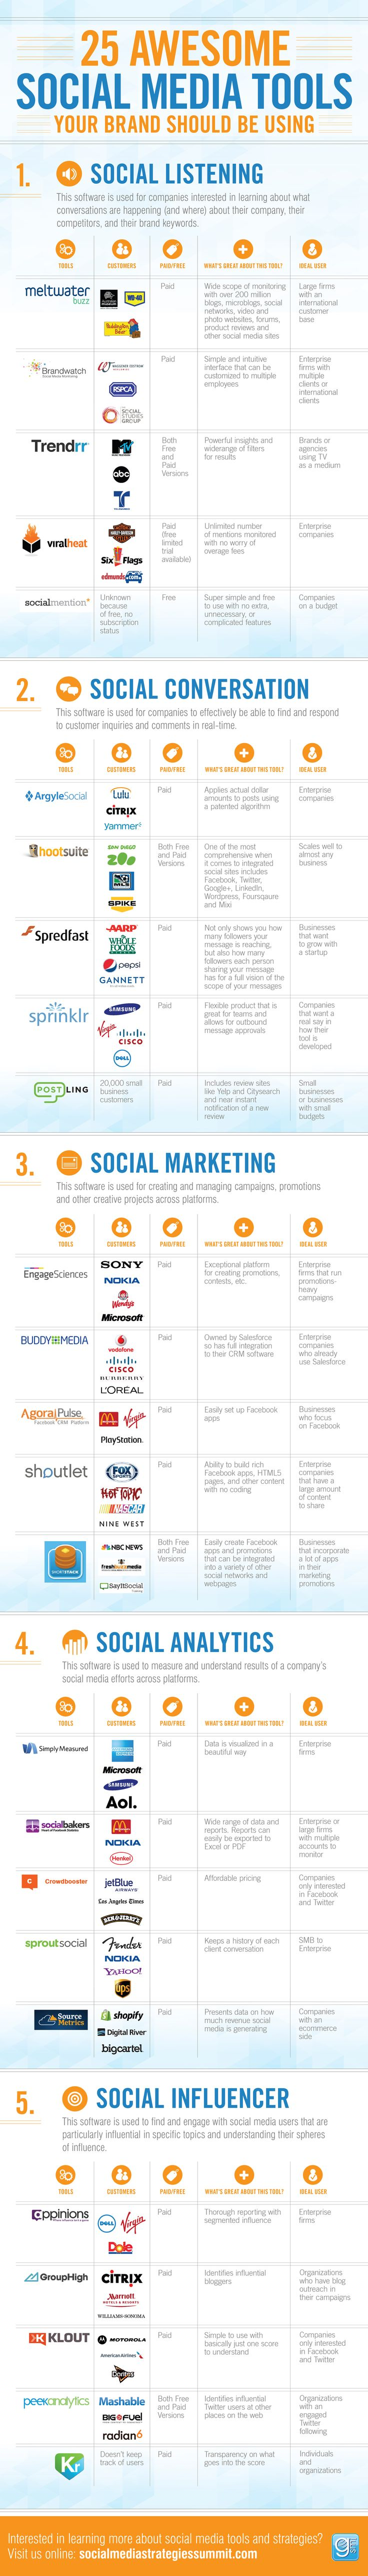 herramientassocialmedia Herramientas de Social Media